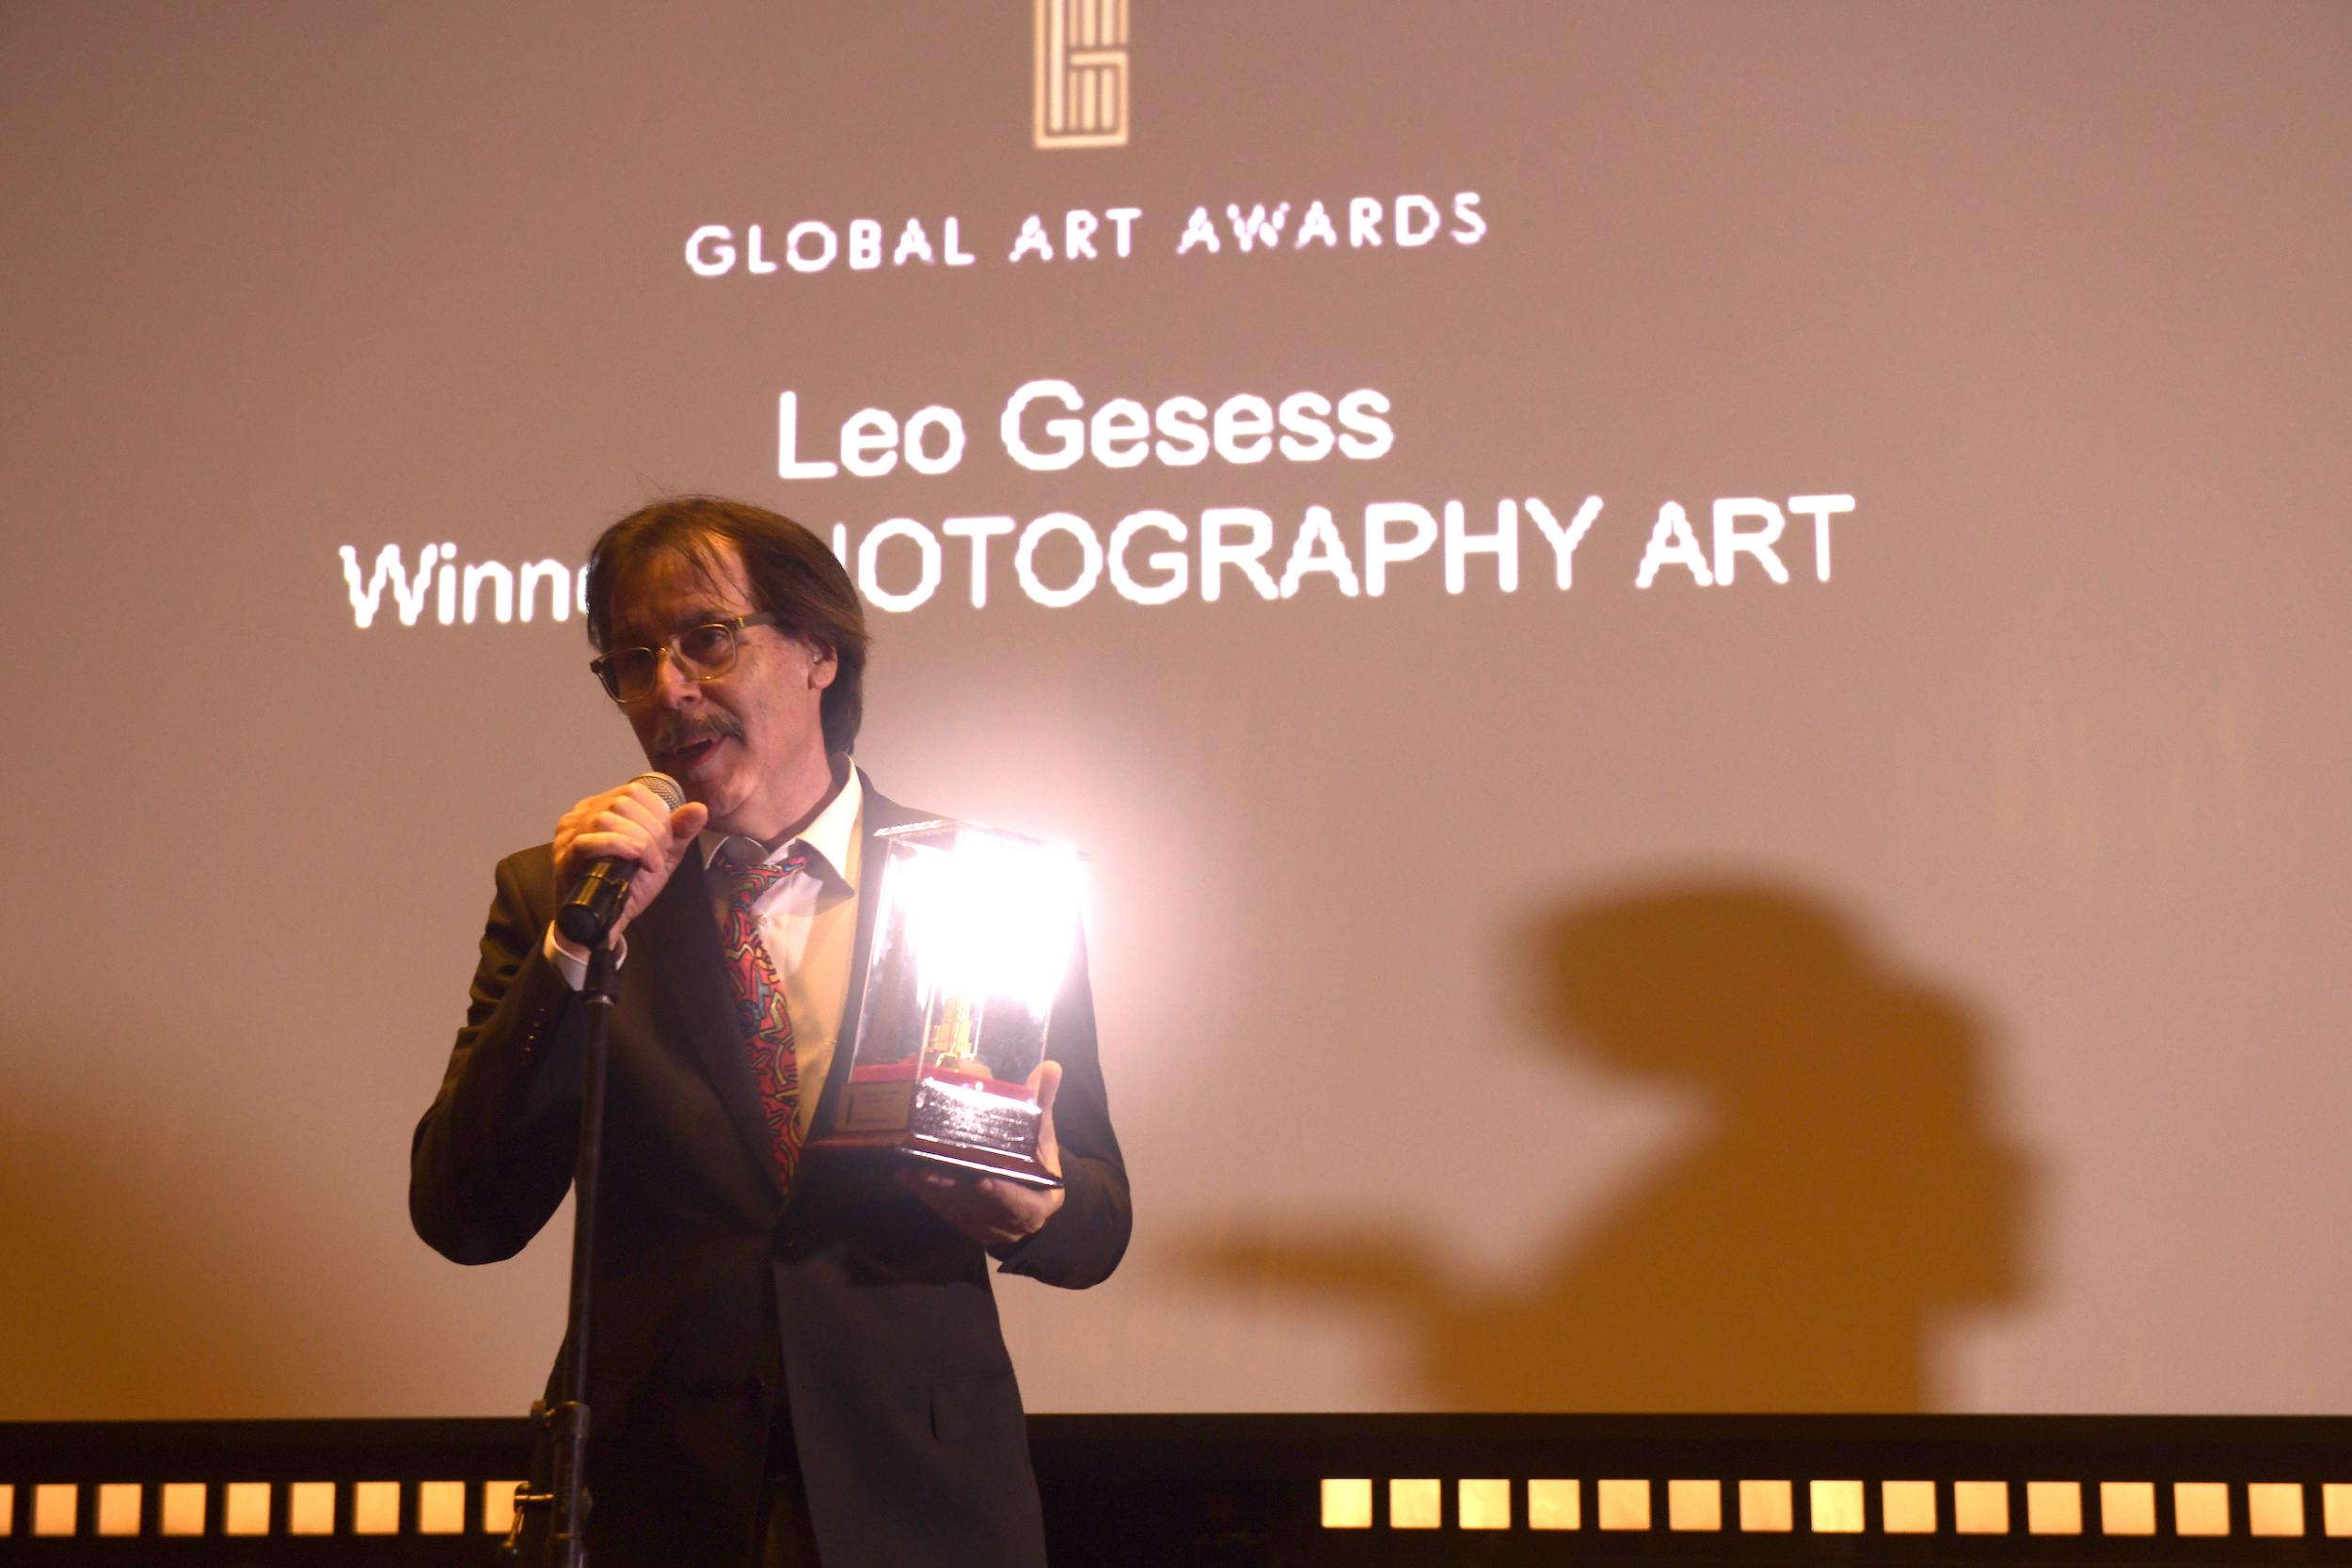 PHOTOGRAPHY ART AWARD   LEO GESESS (SWITZERLAND)